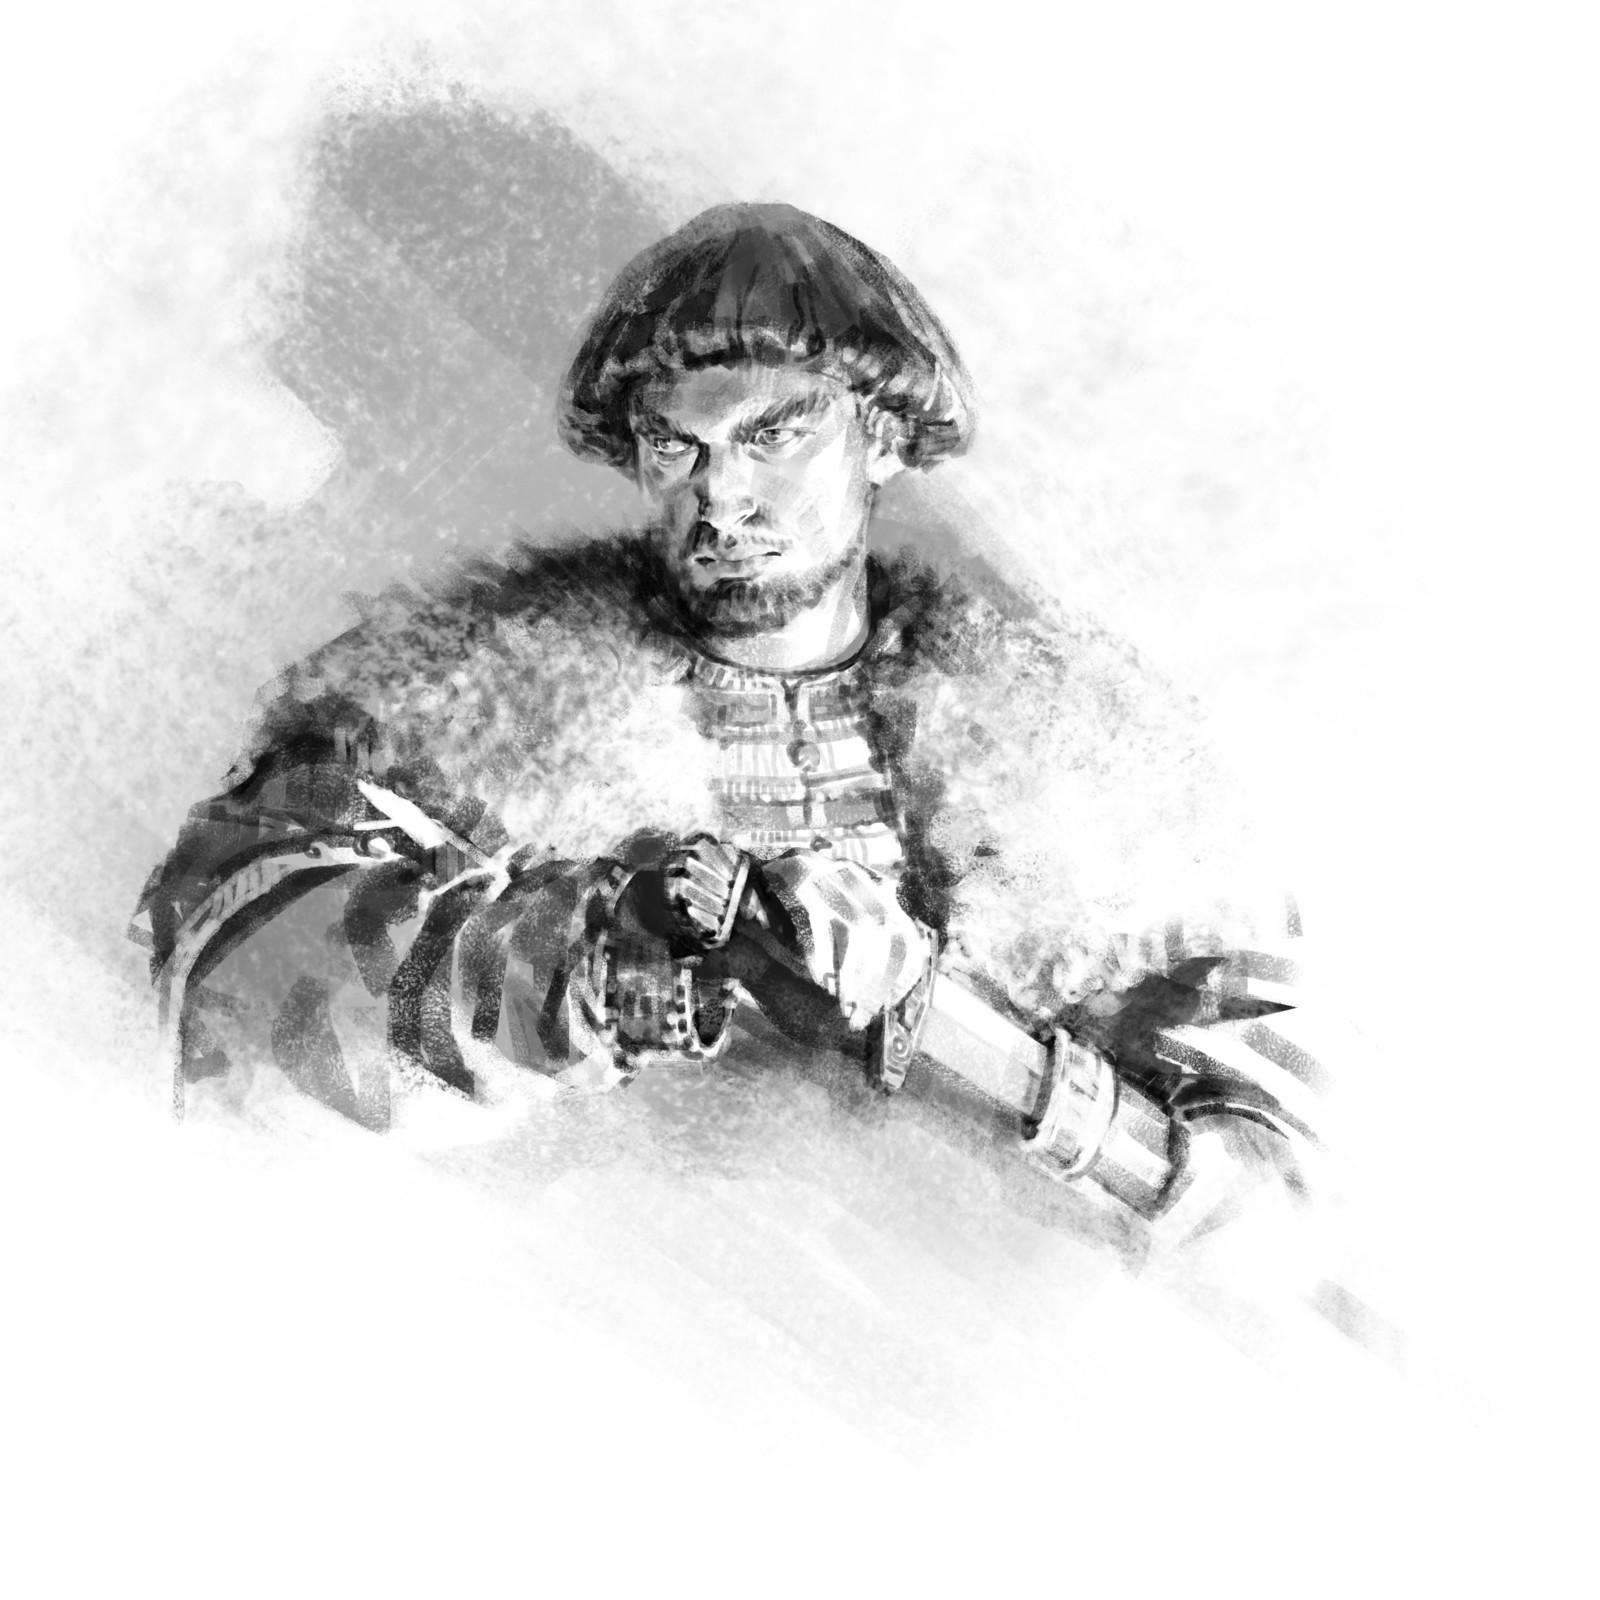 Ivan Tsarevich